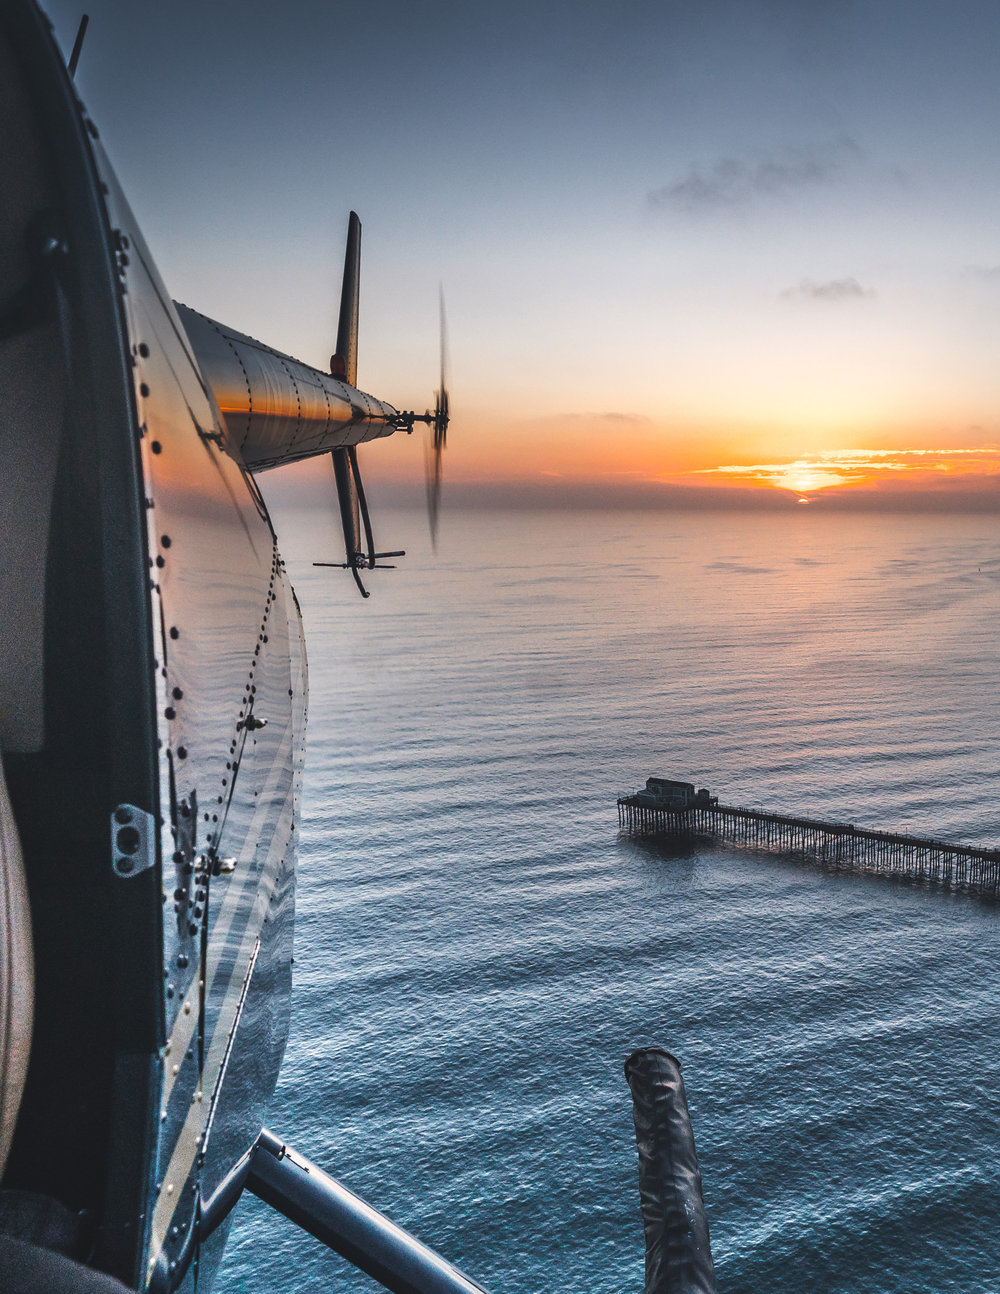 Oceanside Sunset - @camarank